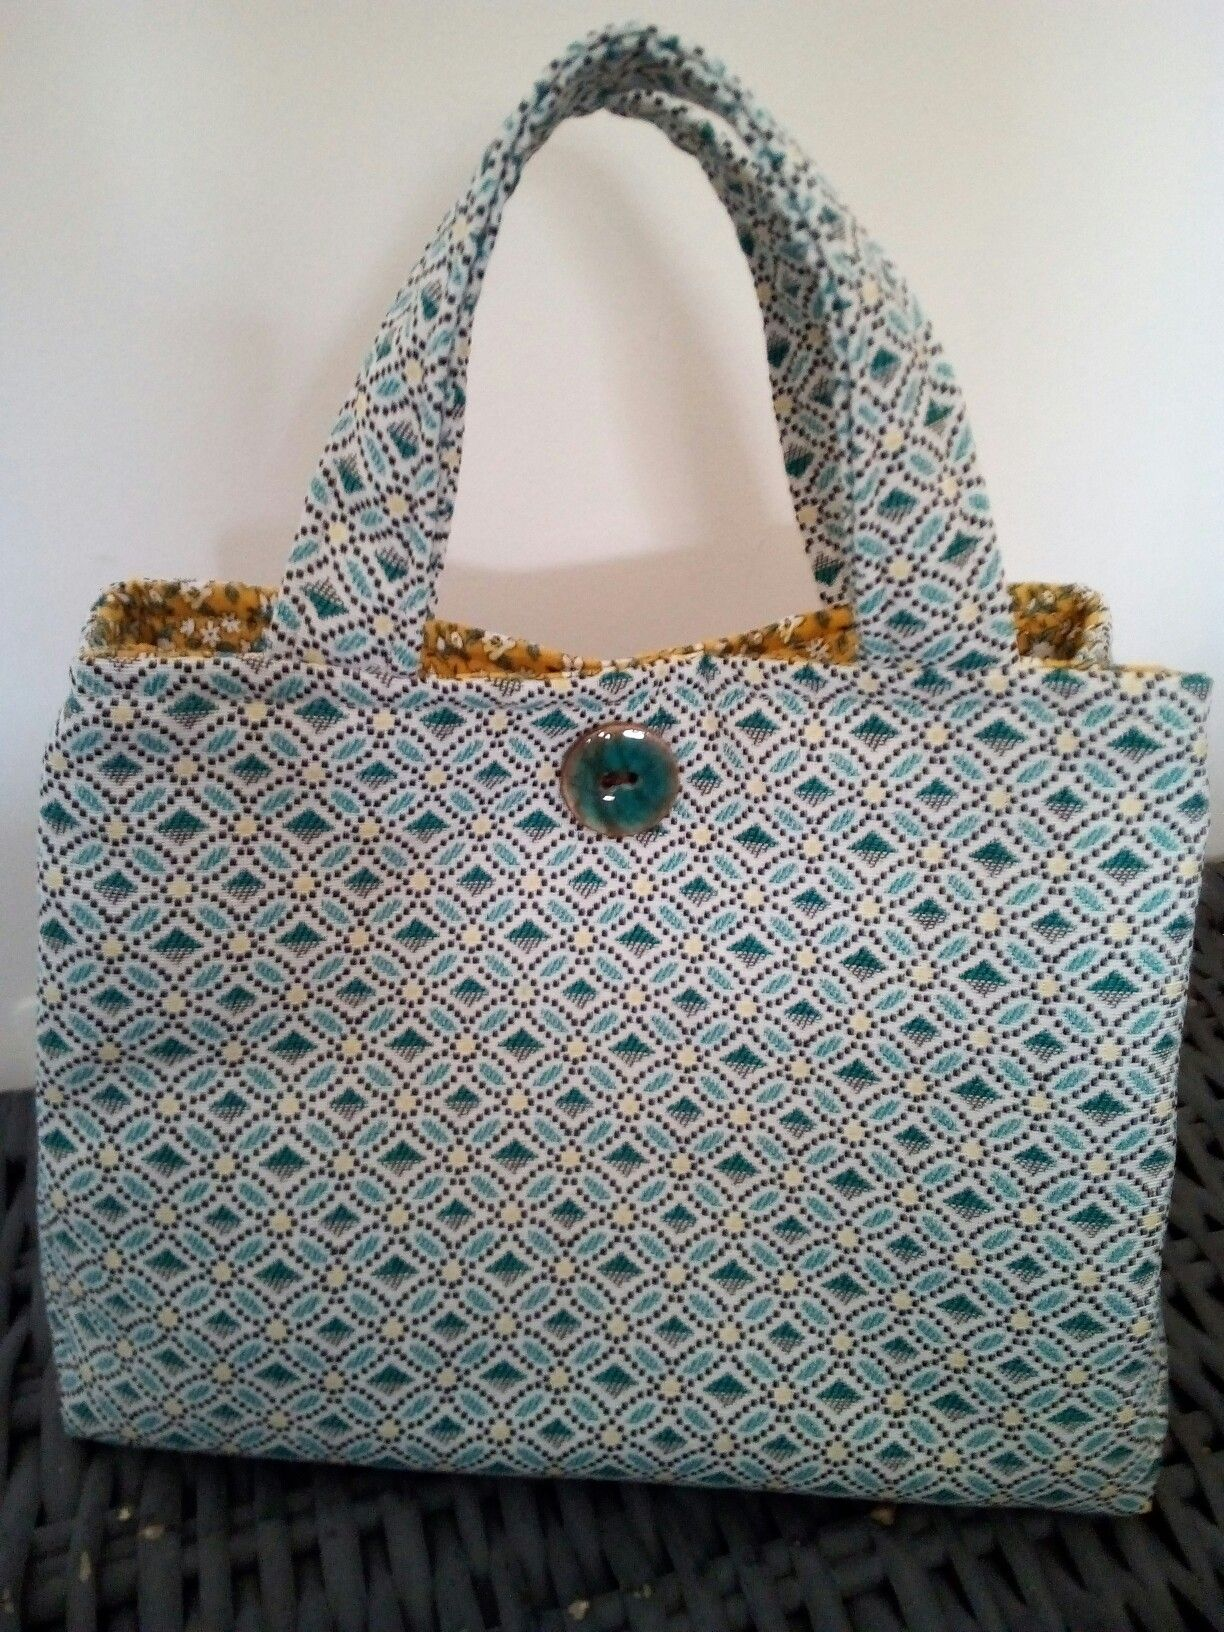 Amazon.com: tote bags